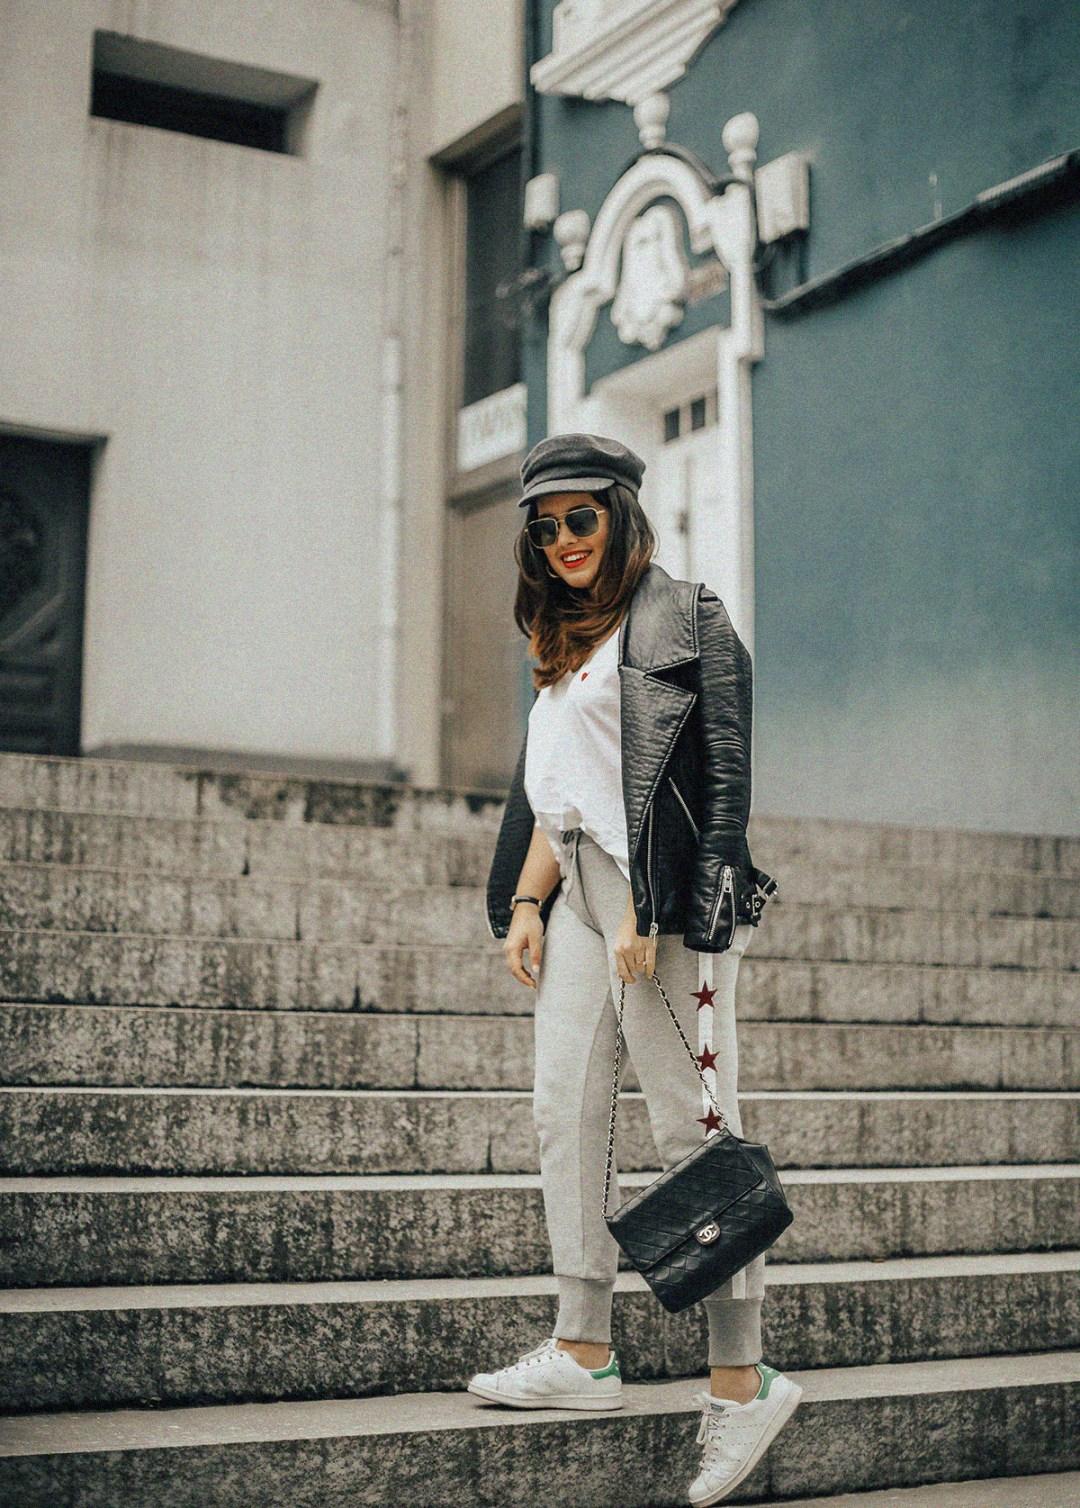 joggers-lovelypepa-collection-stars-look-streetstyle11